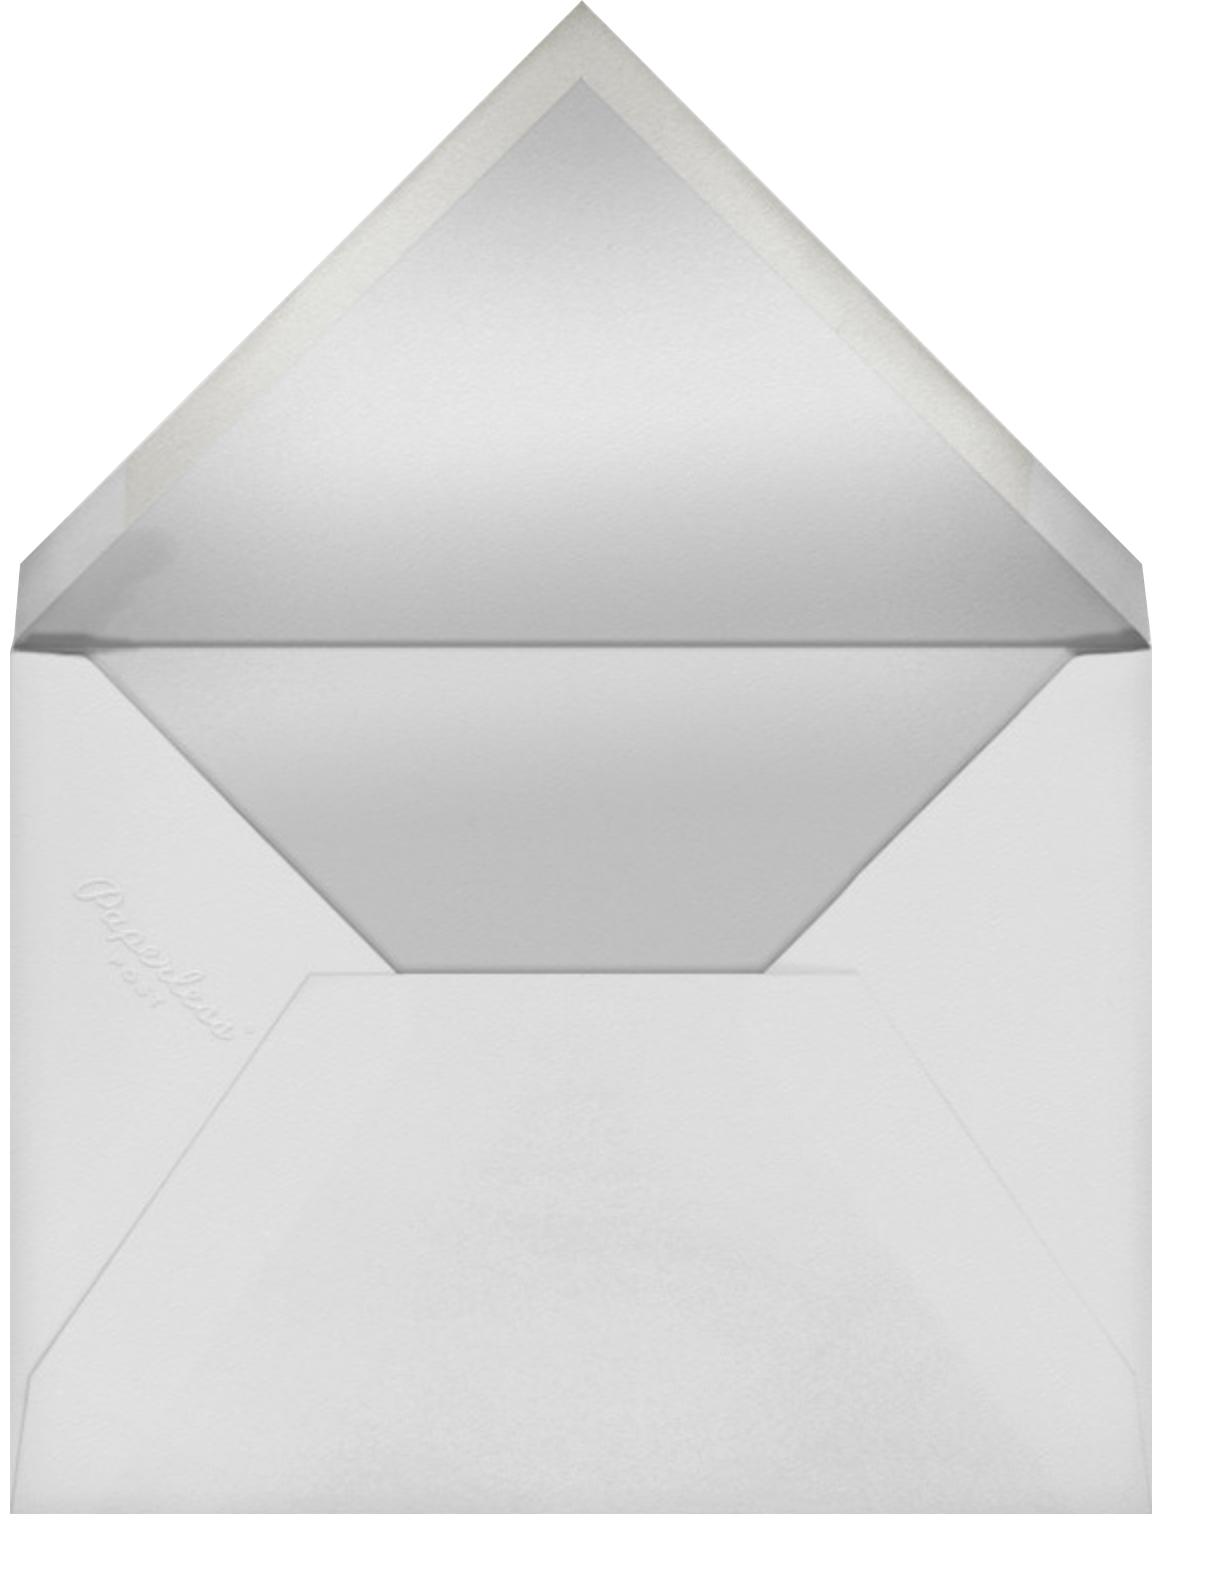 Baby Toque - Spring Rain - Paperless Post - Baby shower - envelope back